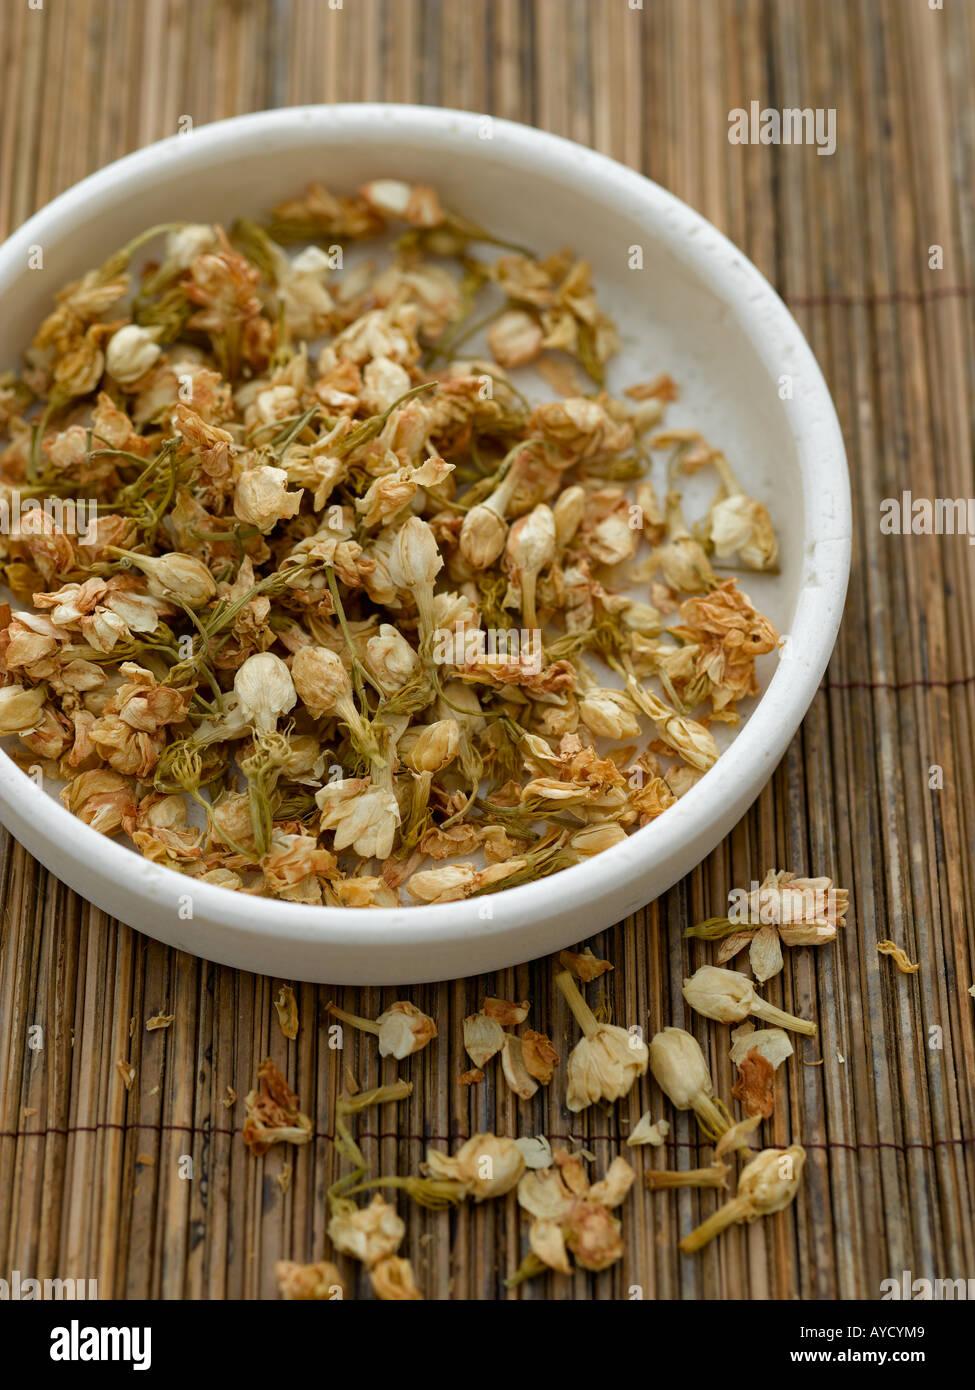 Dried Jasmine Flowers Shot Hasselblad Stock Photos Dried Jasmine